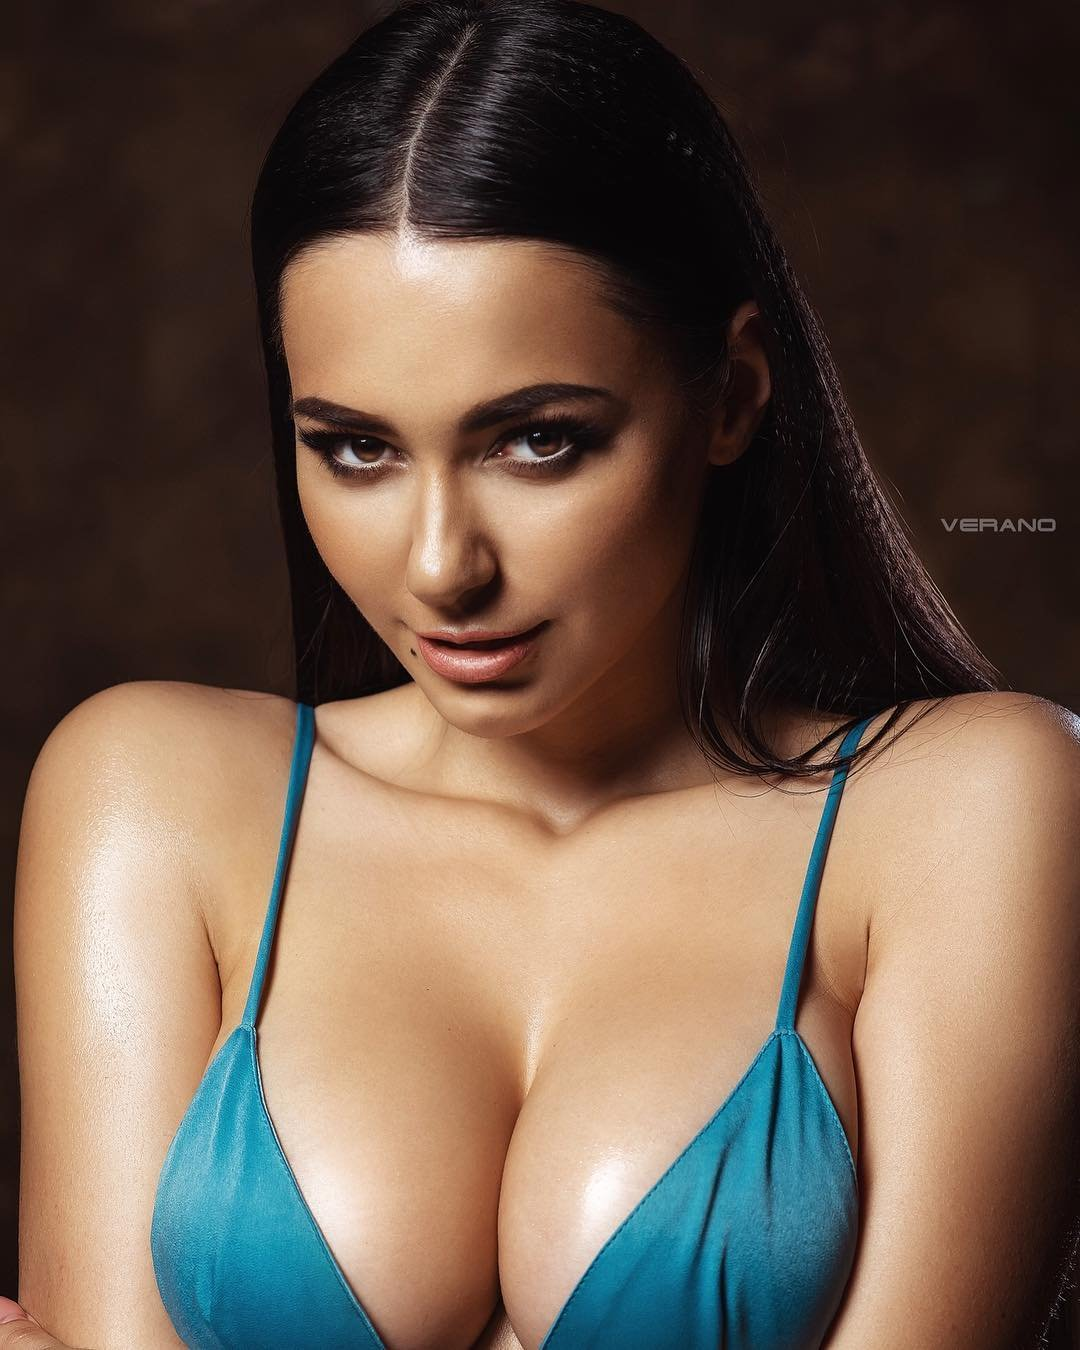 Ariel Winter Ass -,Rebecca Quin Adult tube Danielle lloyd sexy pics 2,Marion peru nude